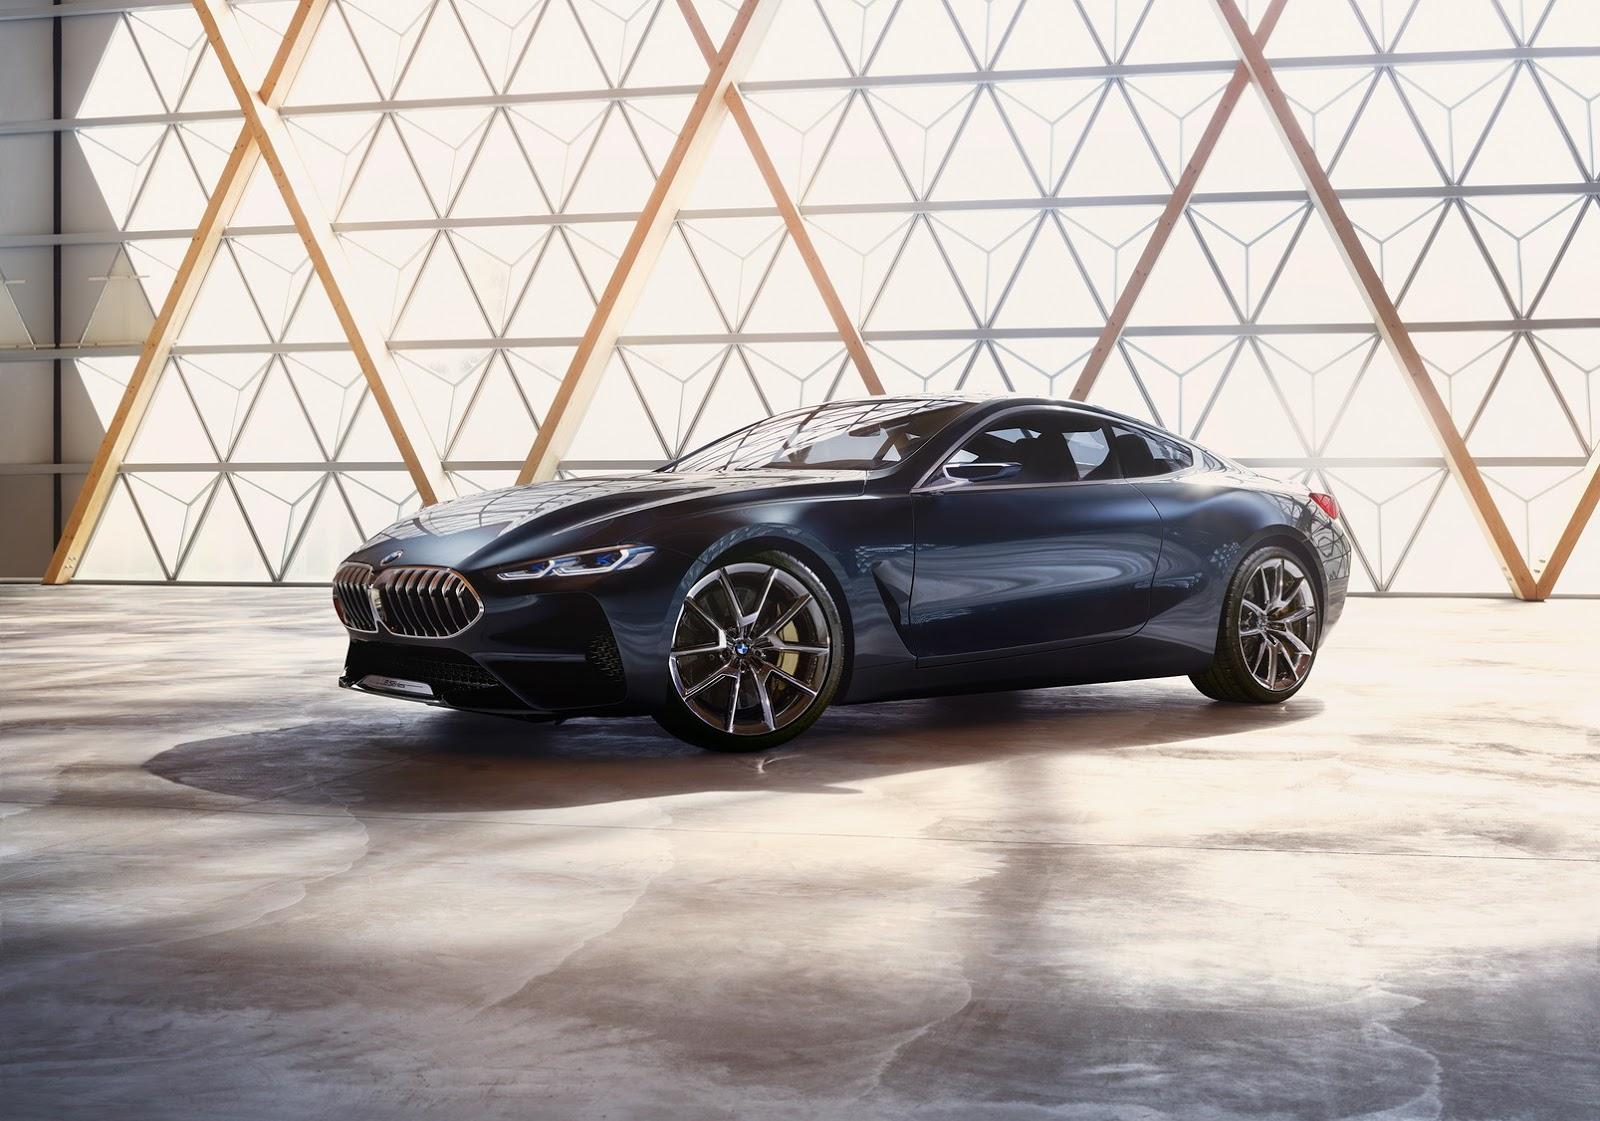 BMW-2019-8-Series-Concept-06